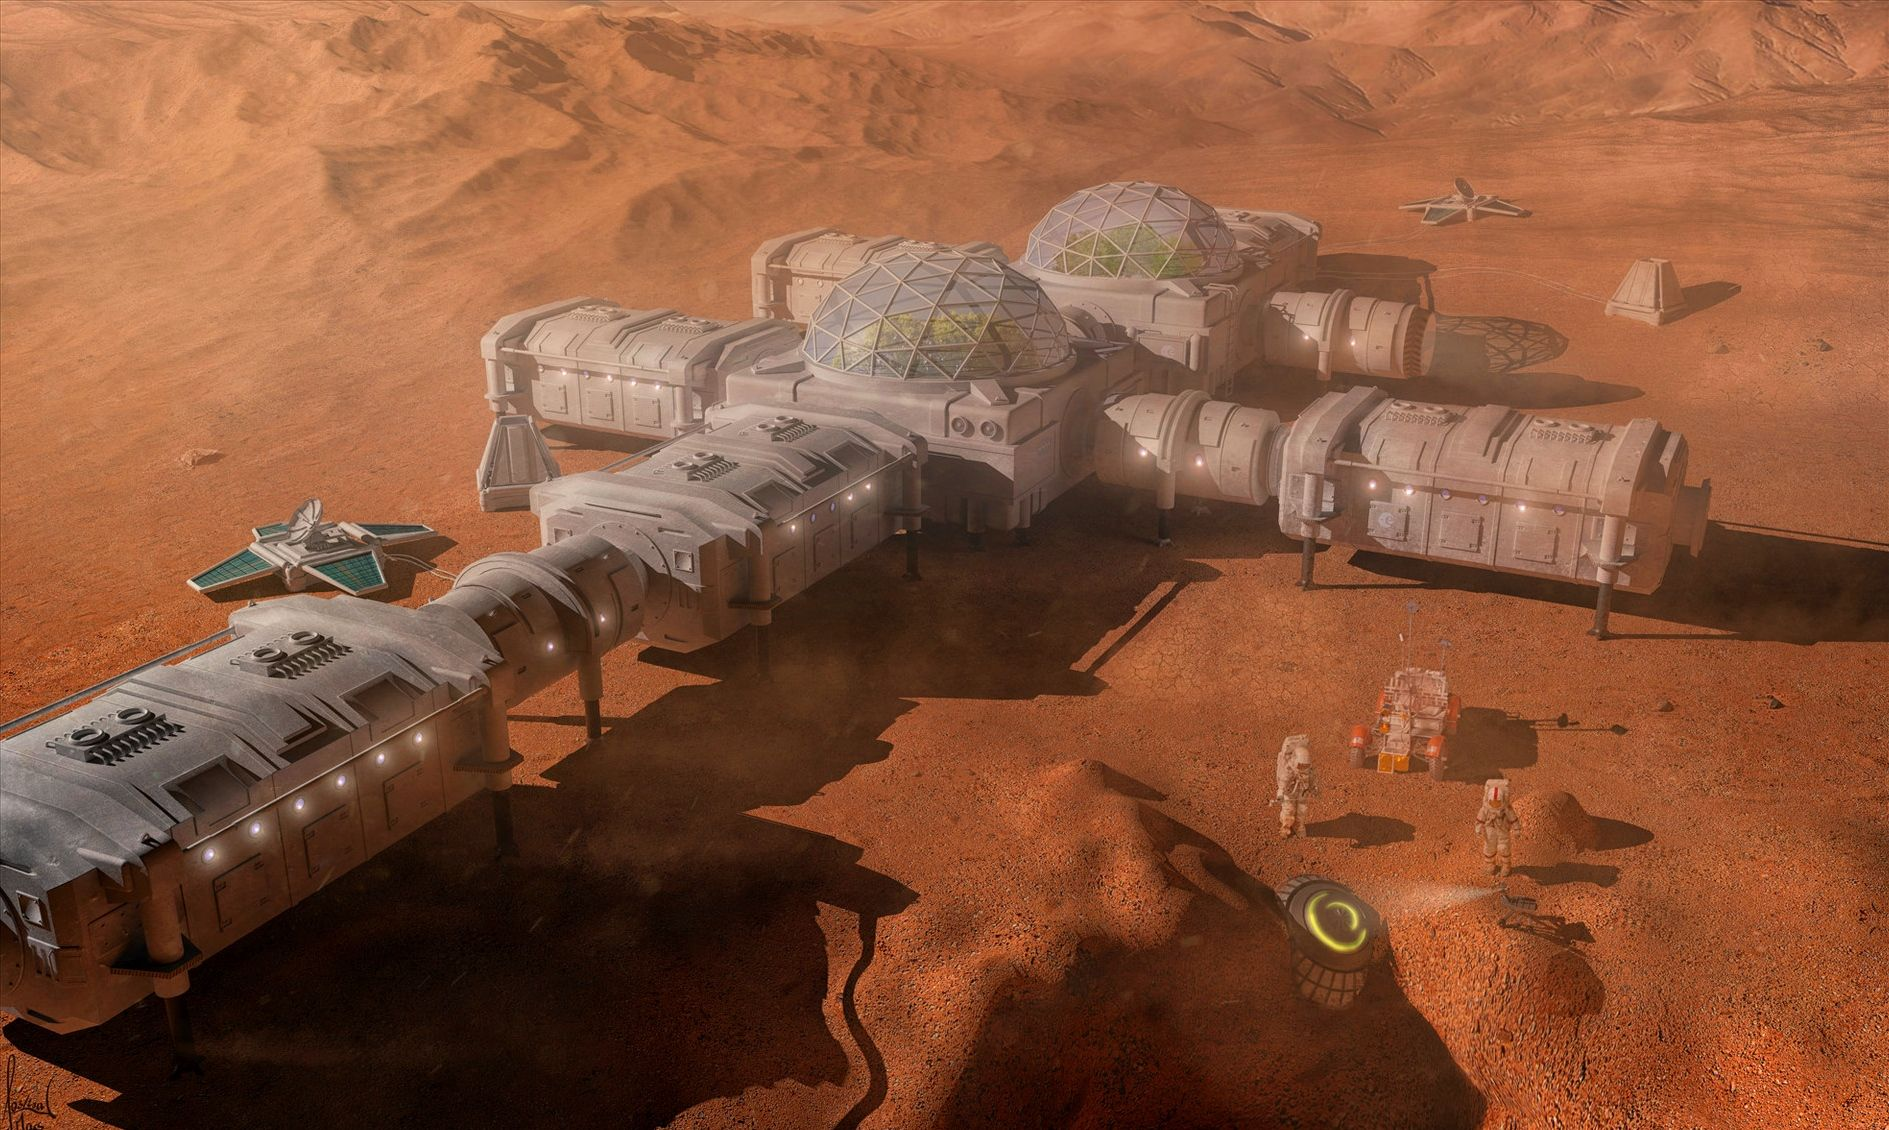 human Mars | Star citizen, Sci fi, Space travel